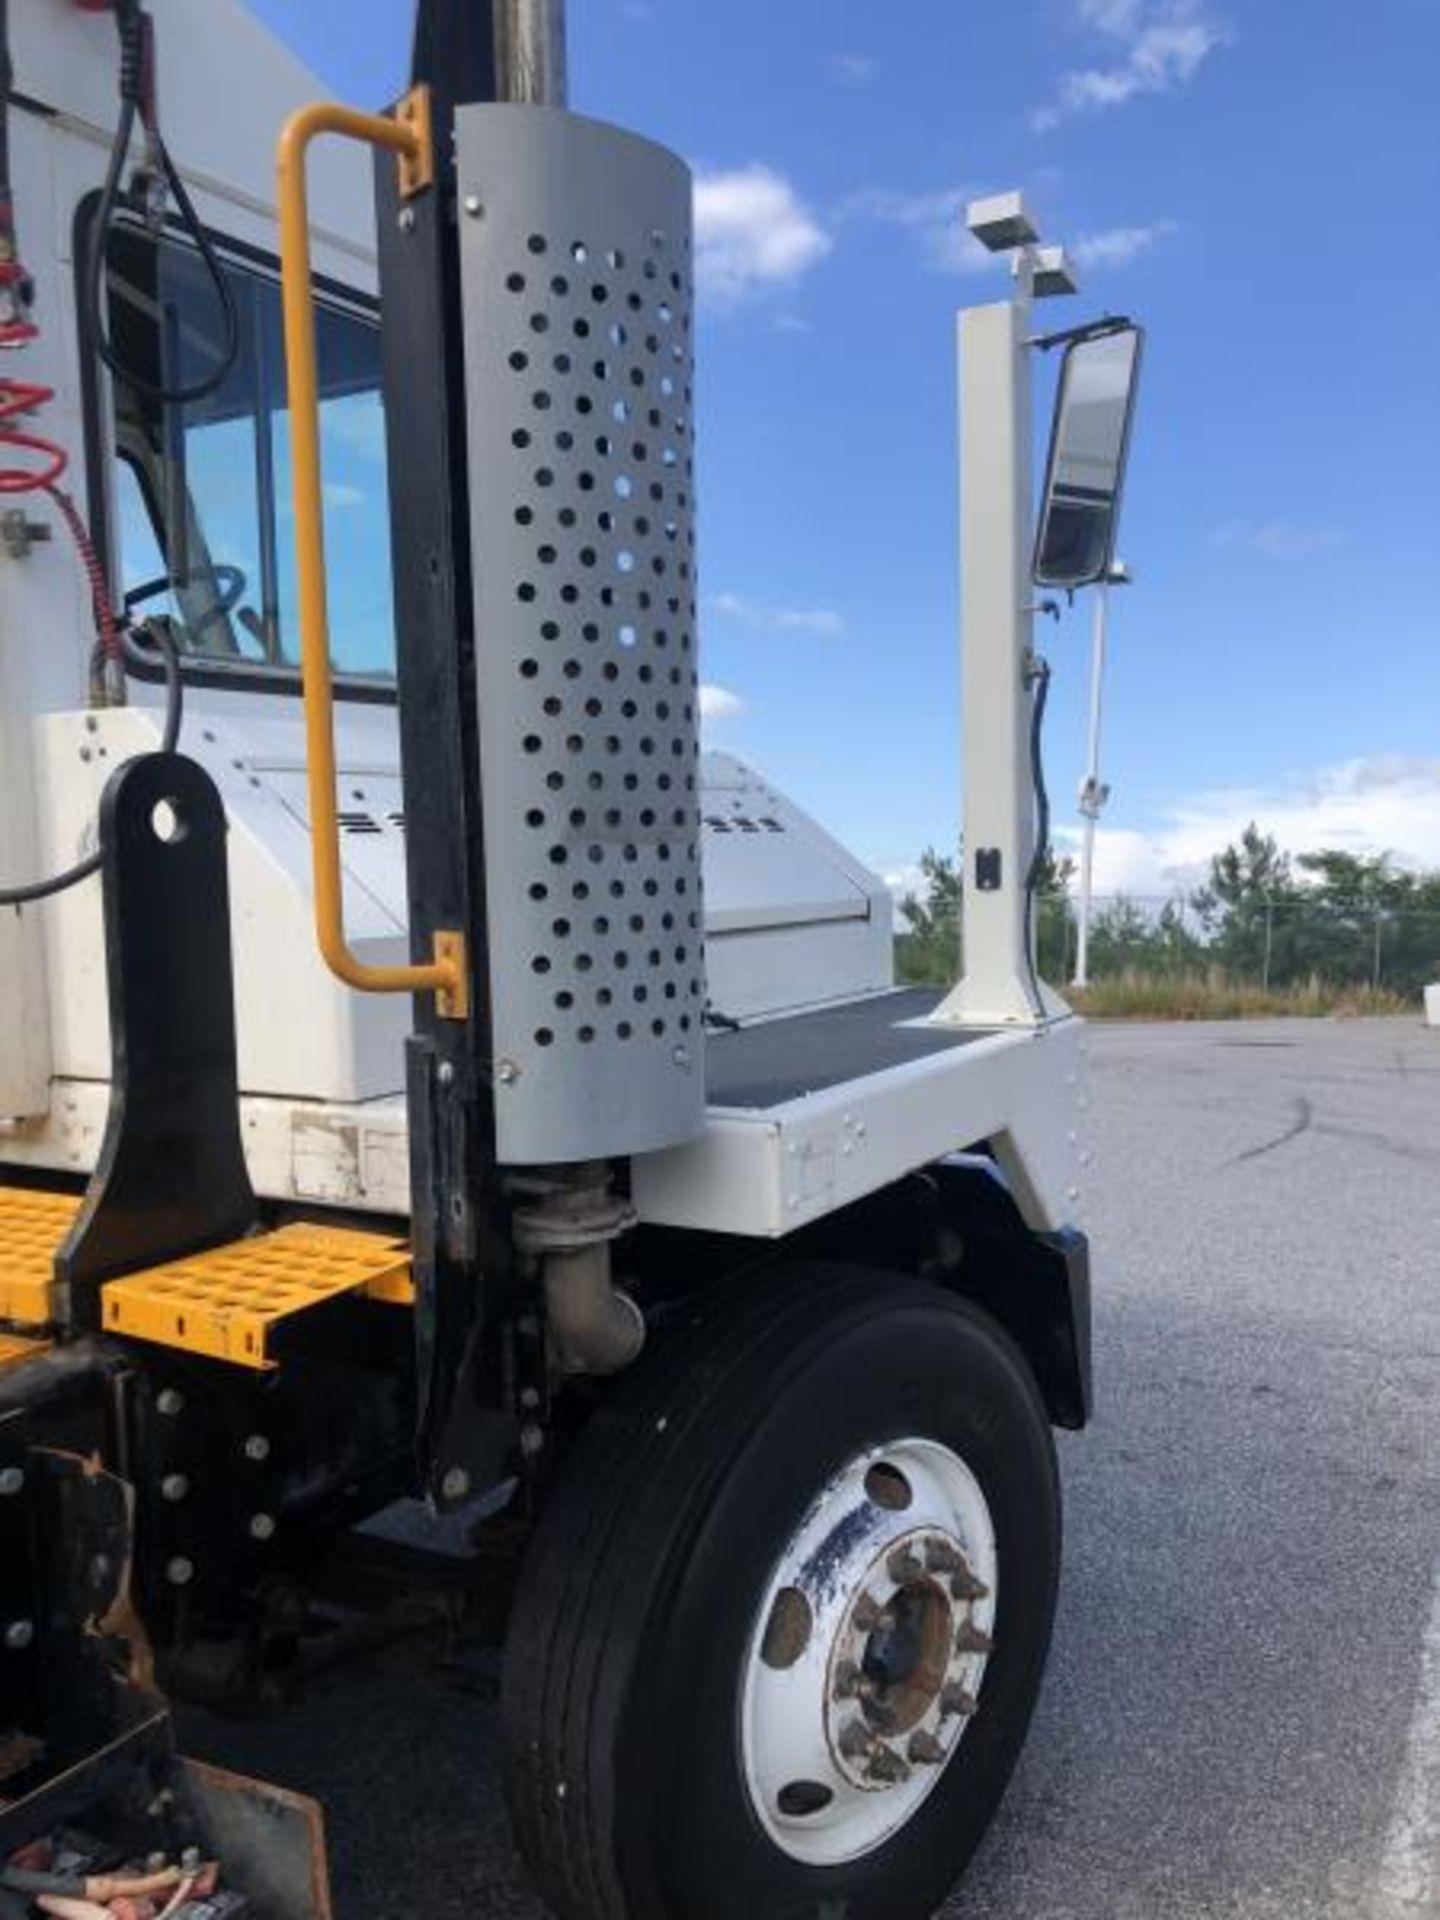 2015 Kalmar Ottawa 4x2 Yard Truck , SN: 338837 3,239.3 Hours, 3,125 Miles - Image 16 of 32